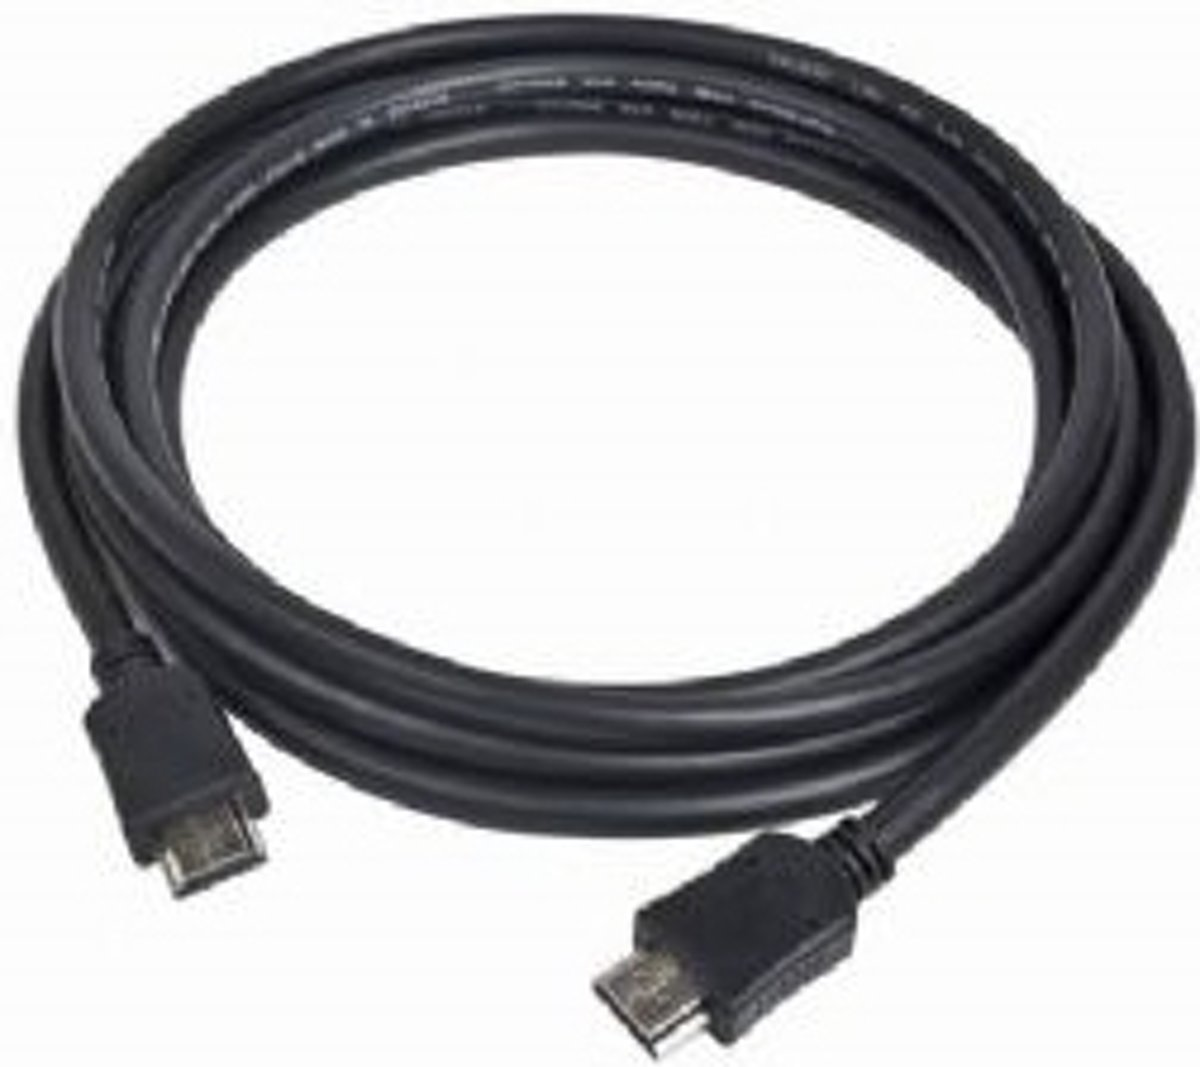 CablExpert CC-HDMI4-10 - Kabel HDMI 1.4 / 2.0, 3 meter kopen